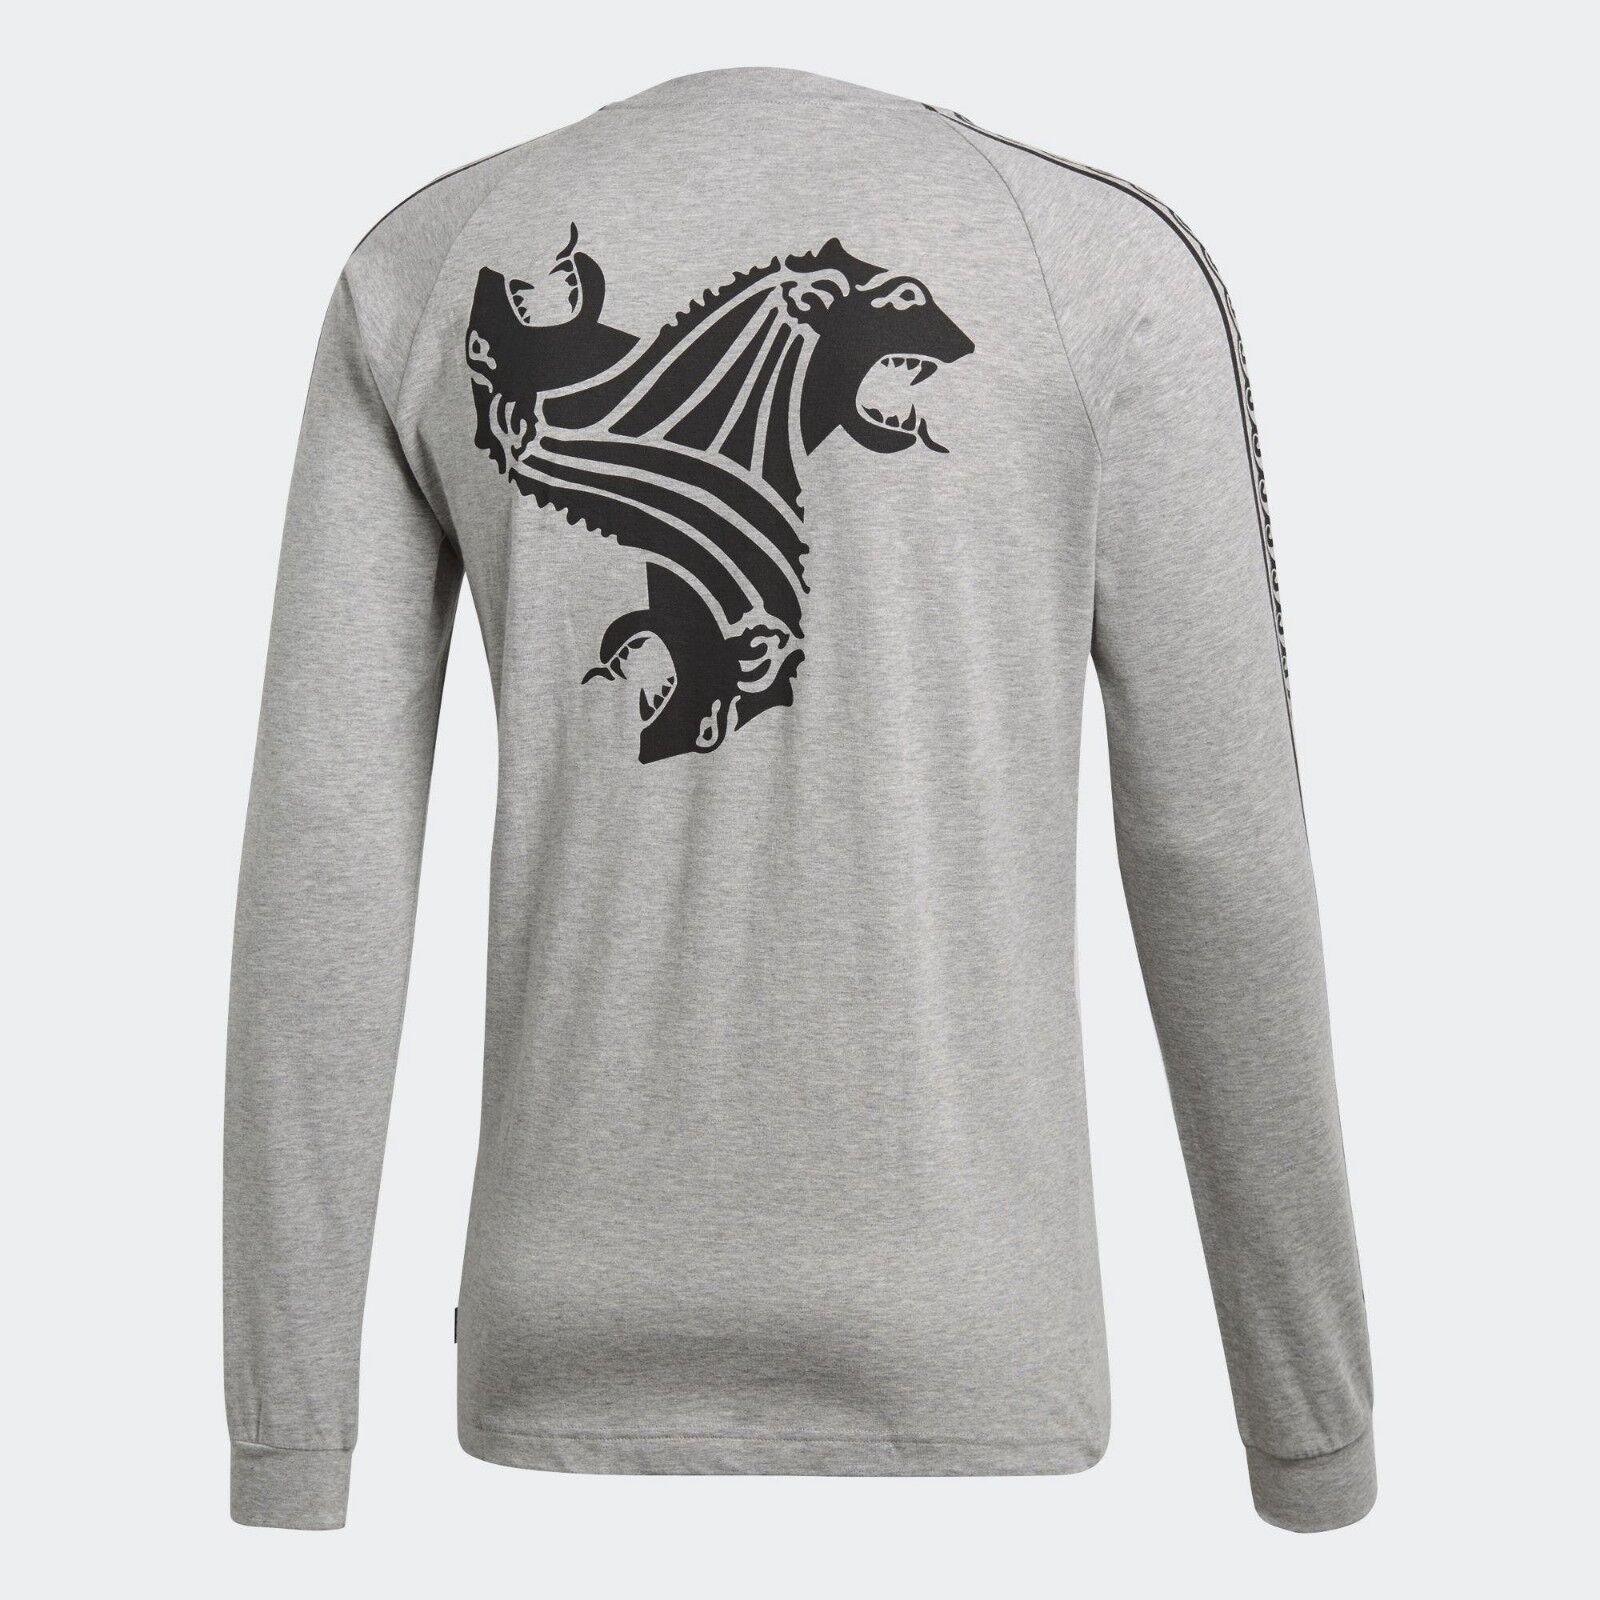 adidas Men's Tango Graphic Long Sleeve Shirt